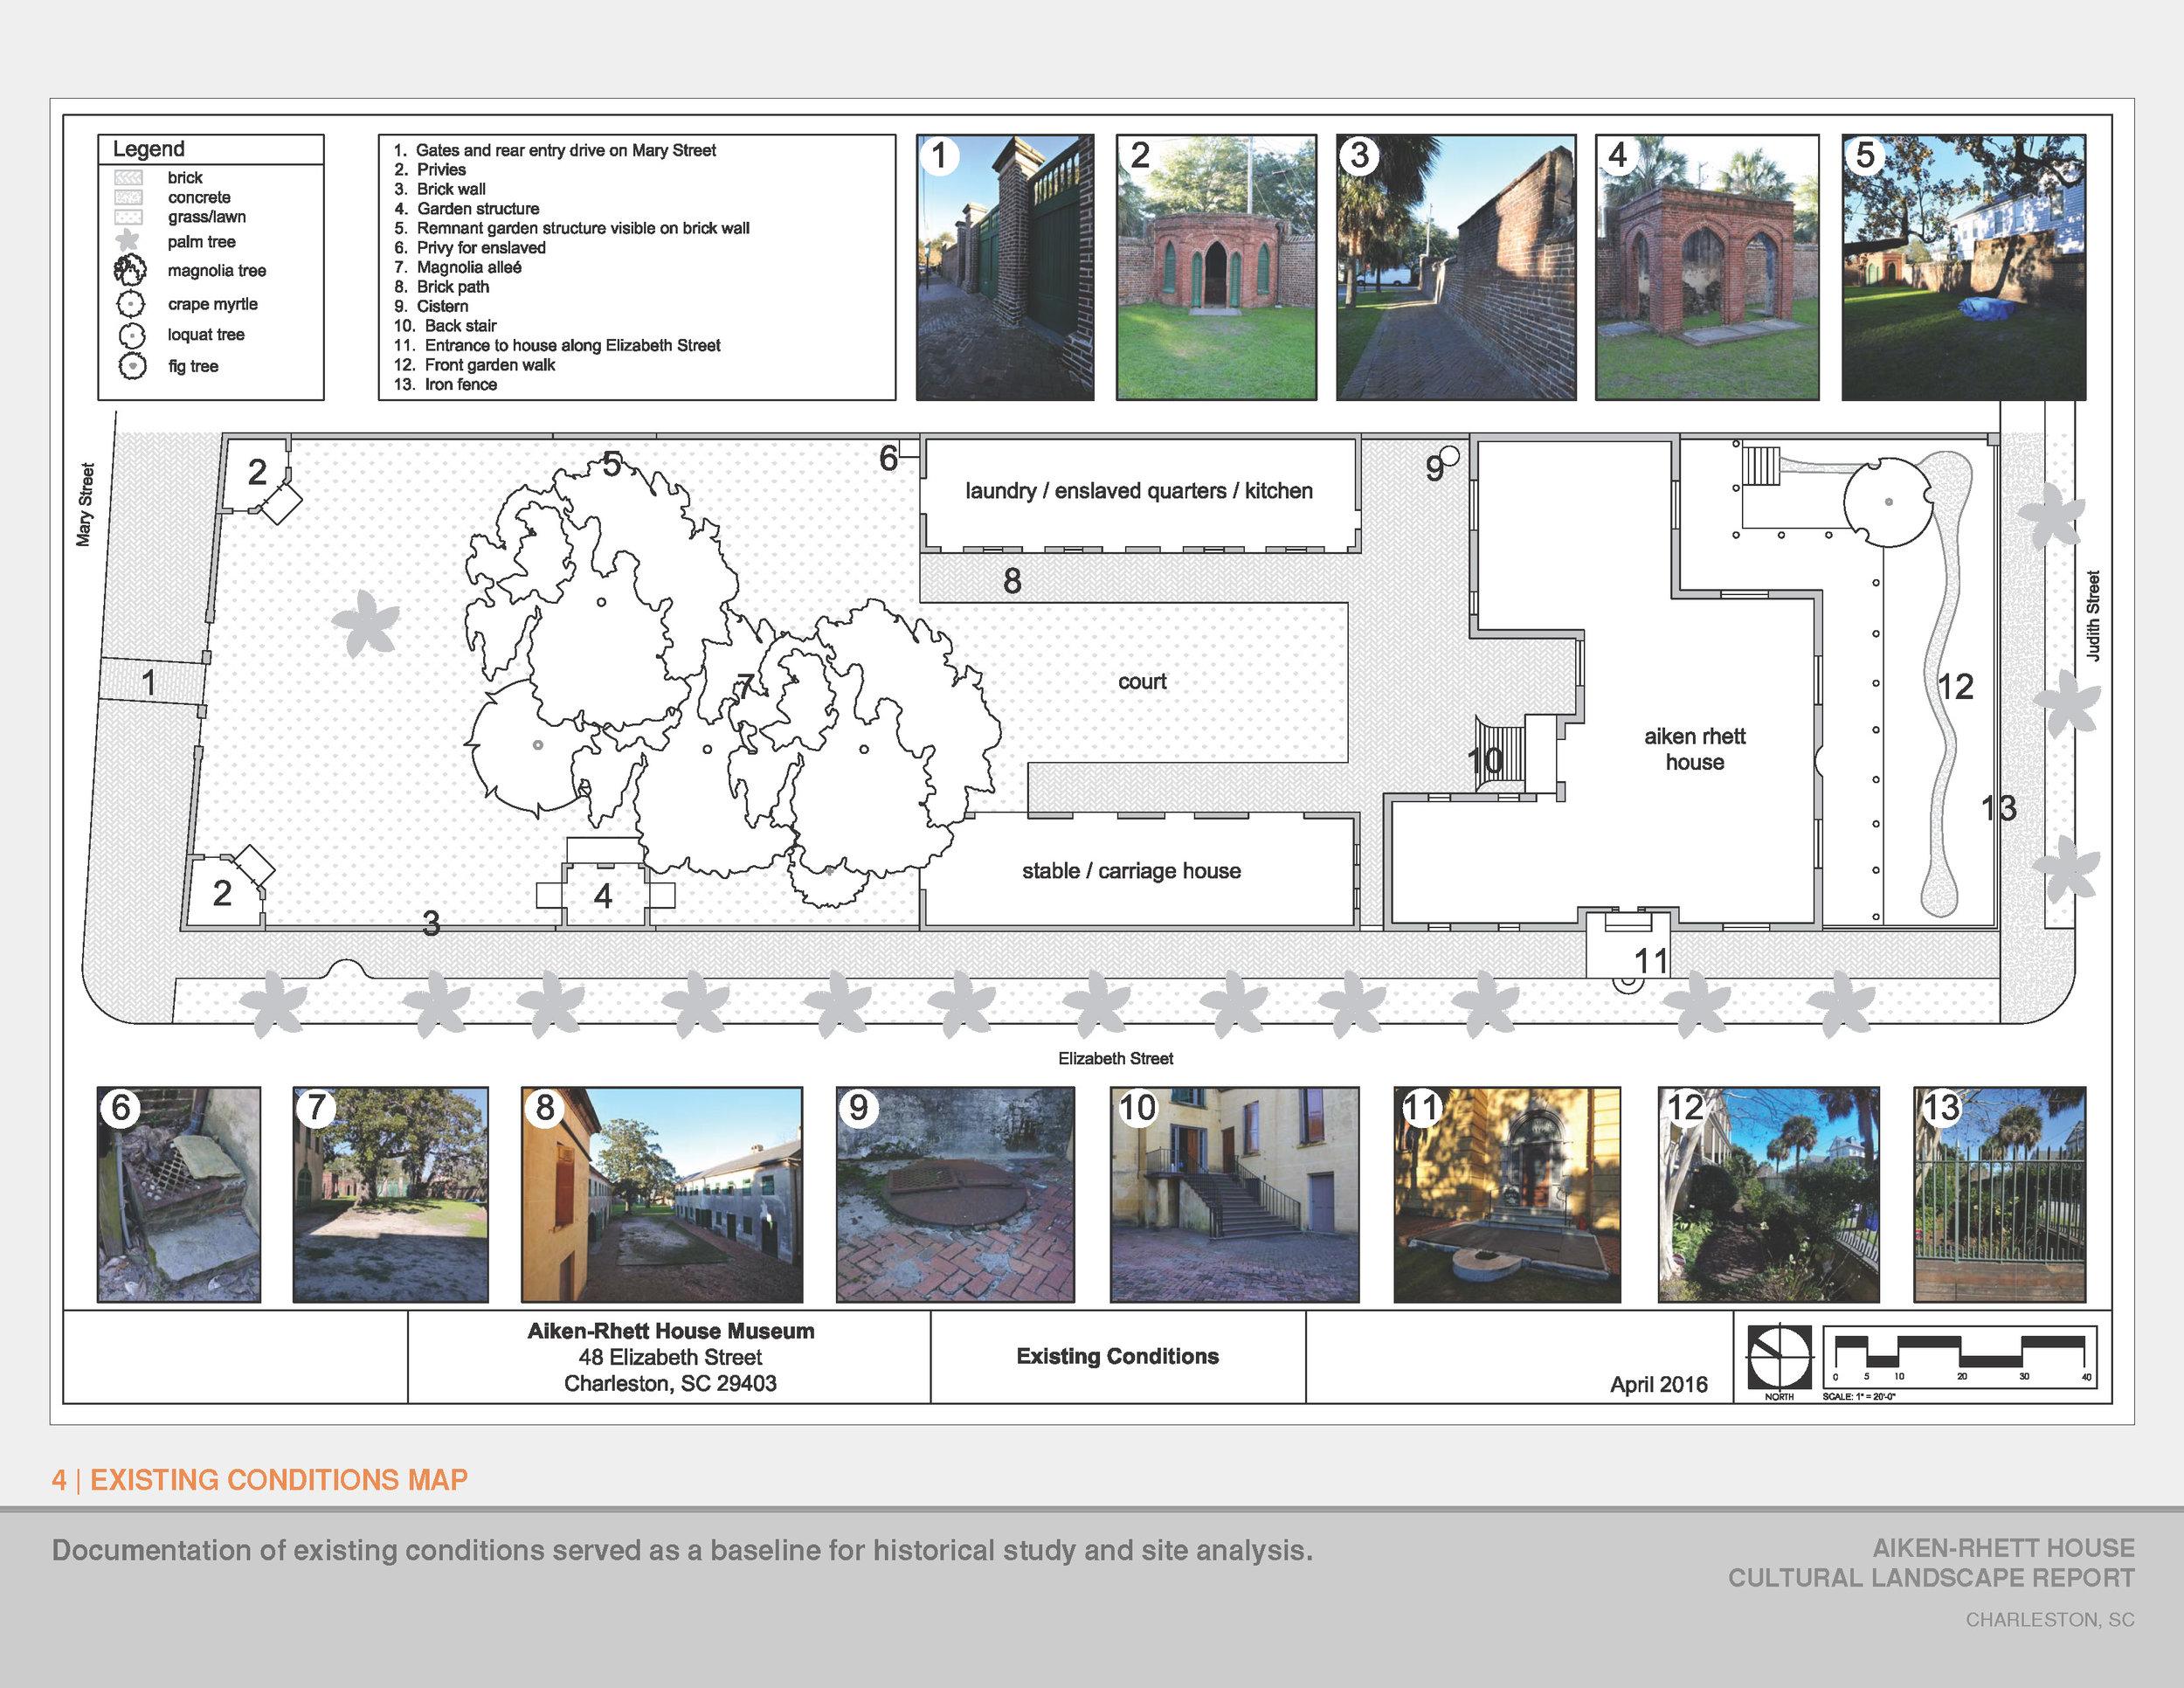 Suzanne Turner Associates - Aiken-Rhett House Report_Page_04.jpg